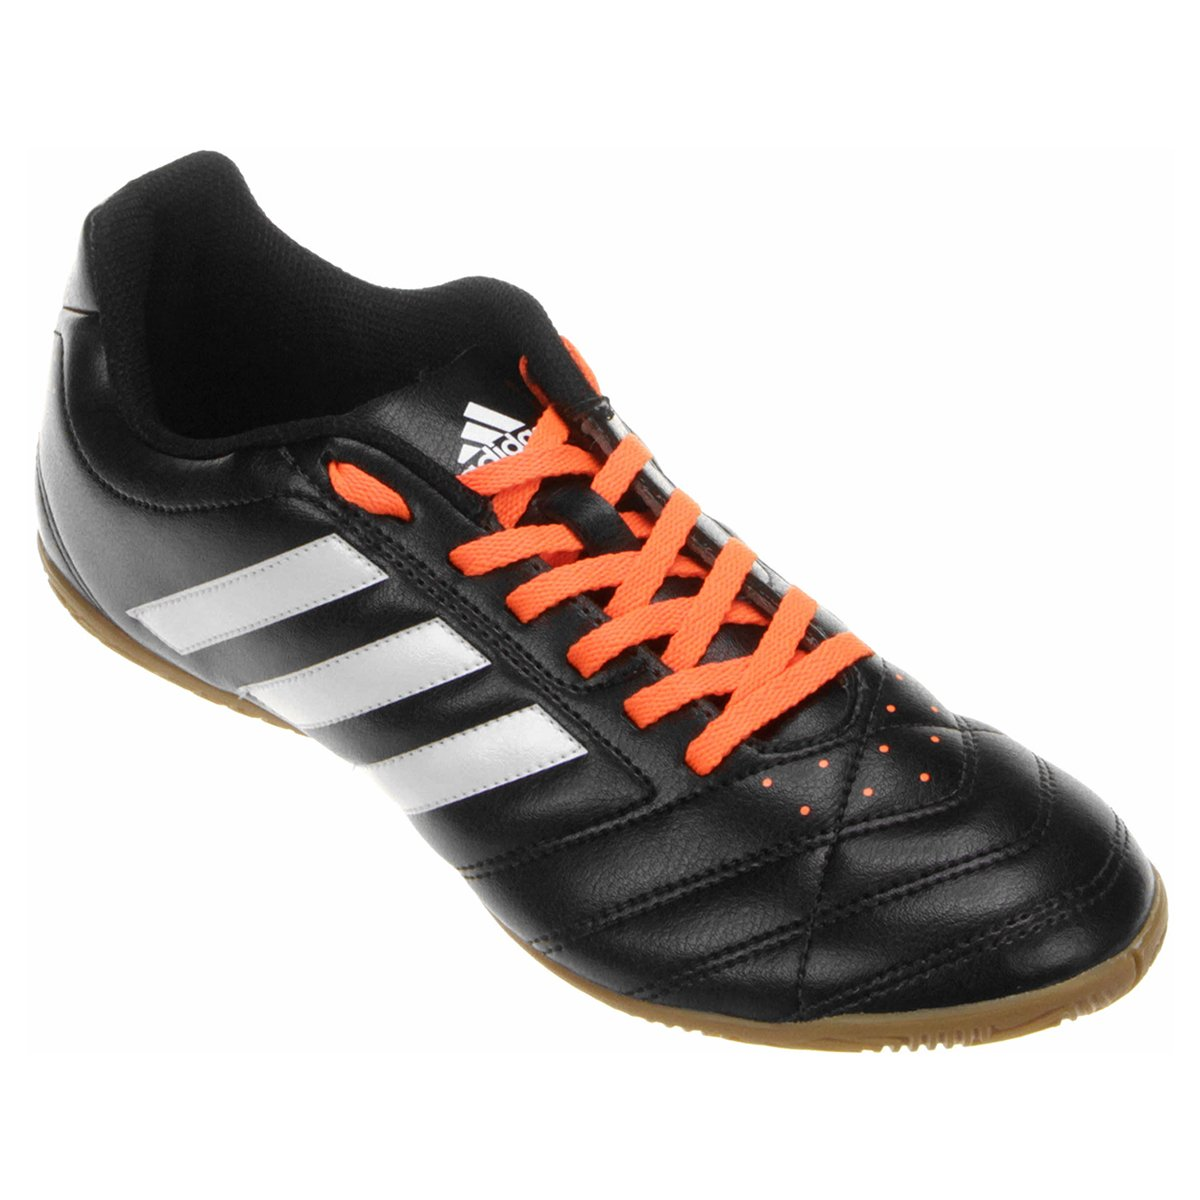 Chuteira Futsal Adidas Goletto 5 IN Masculina - Compre Agora  ca473d86b40d8